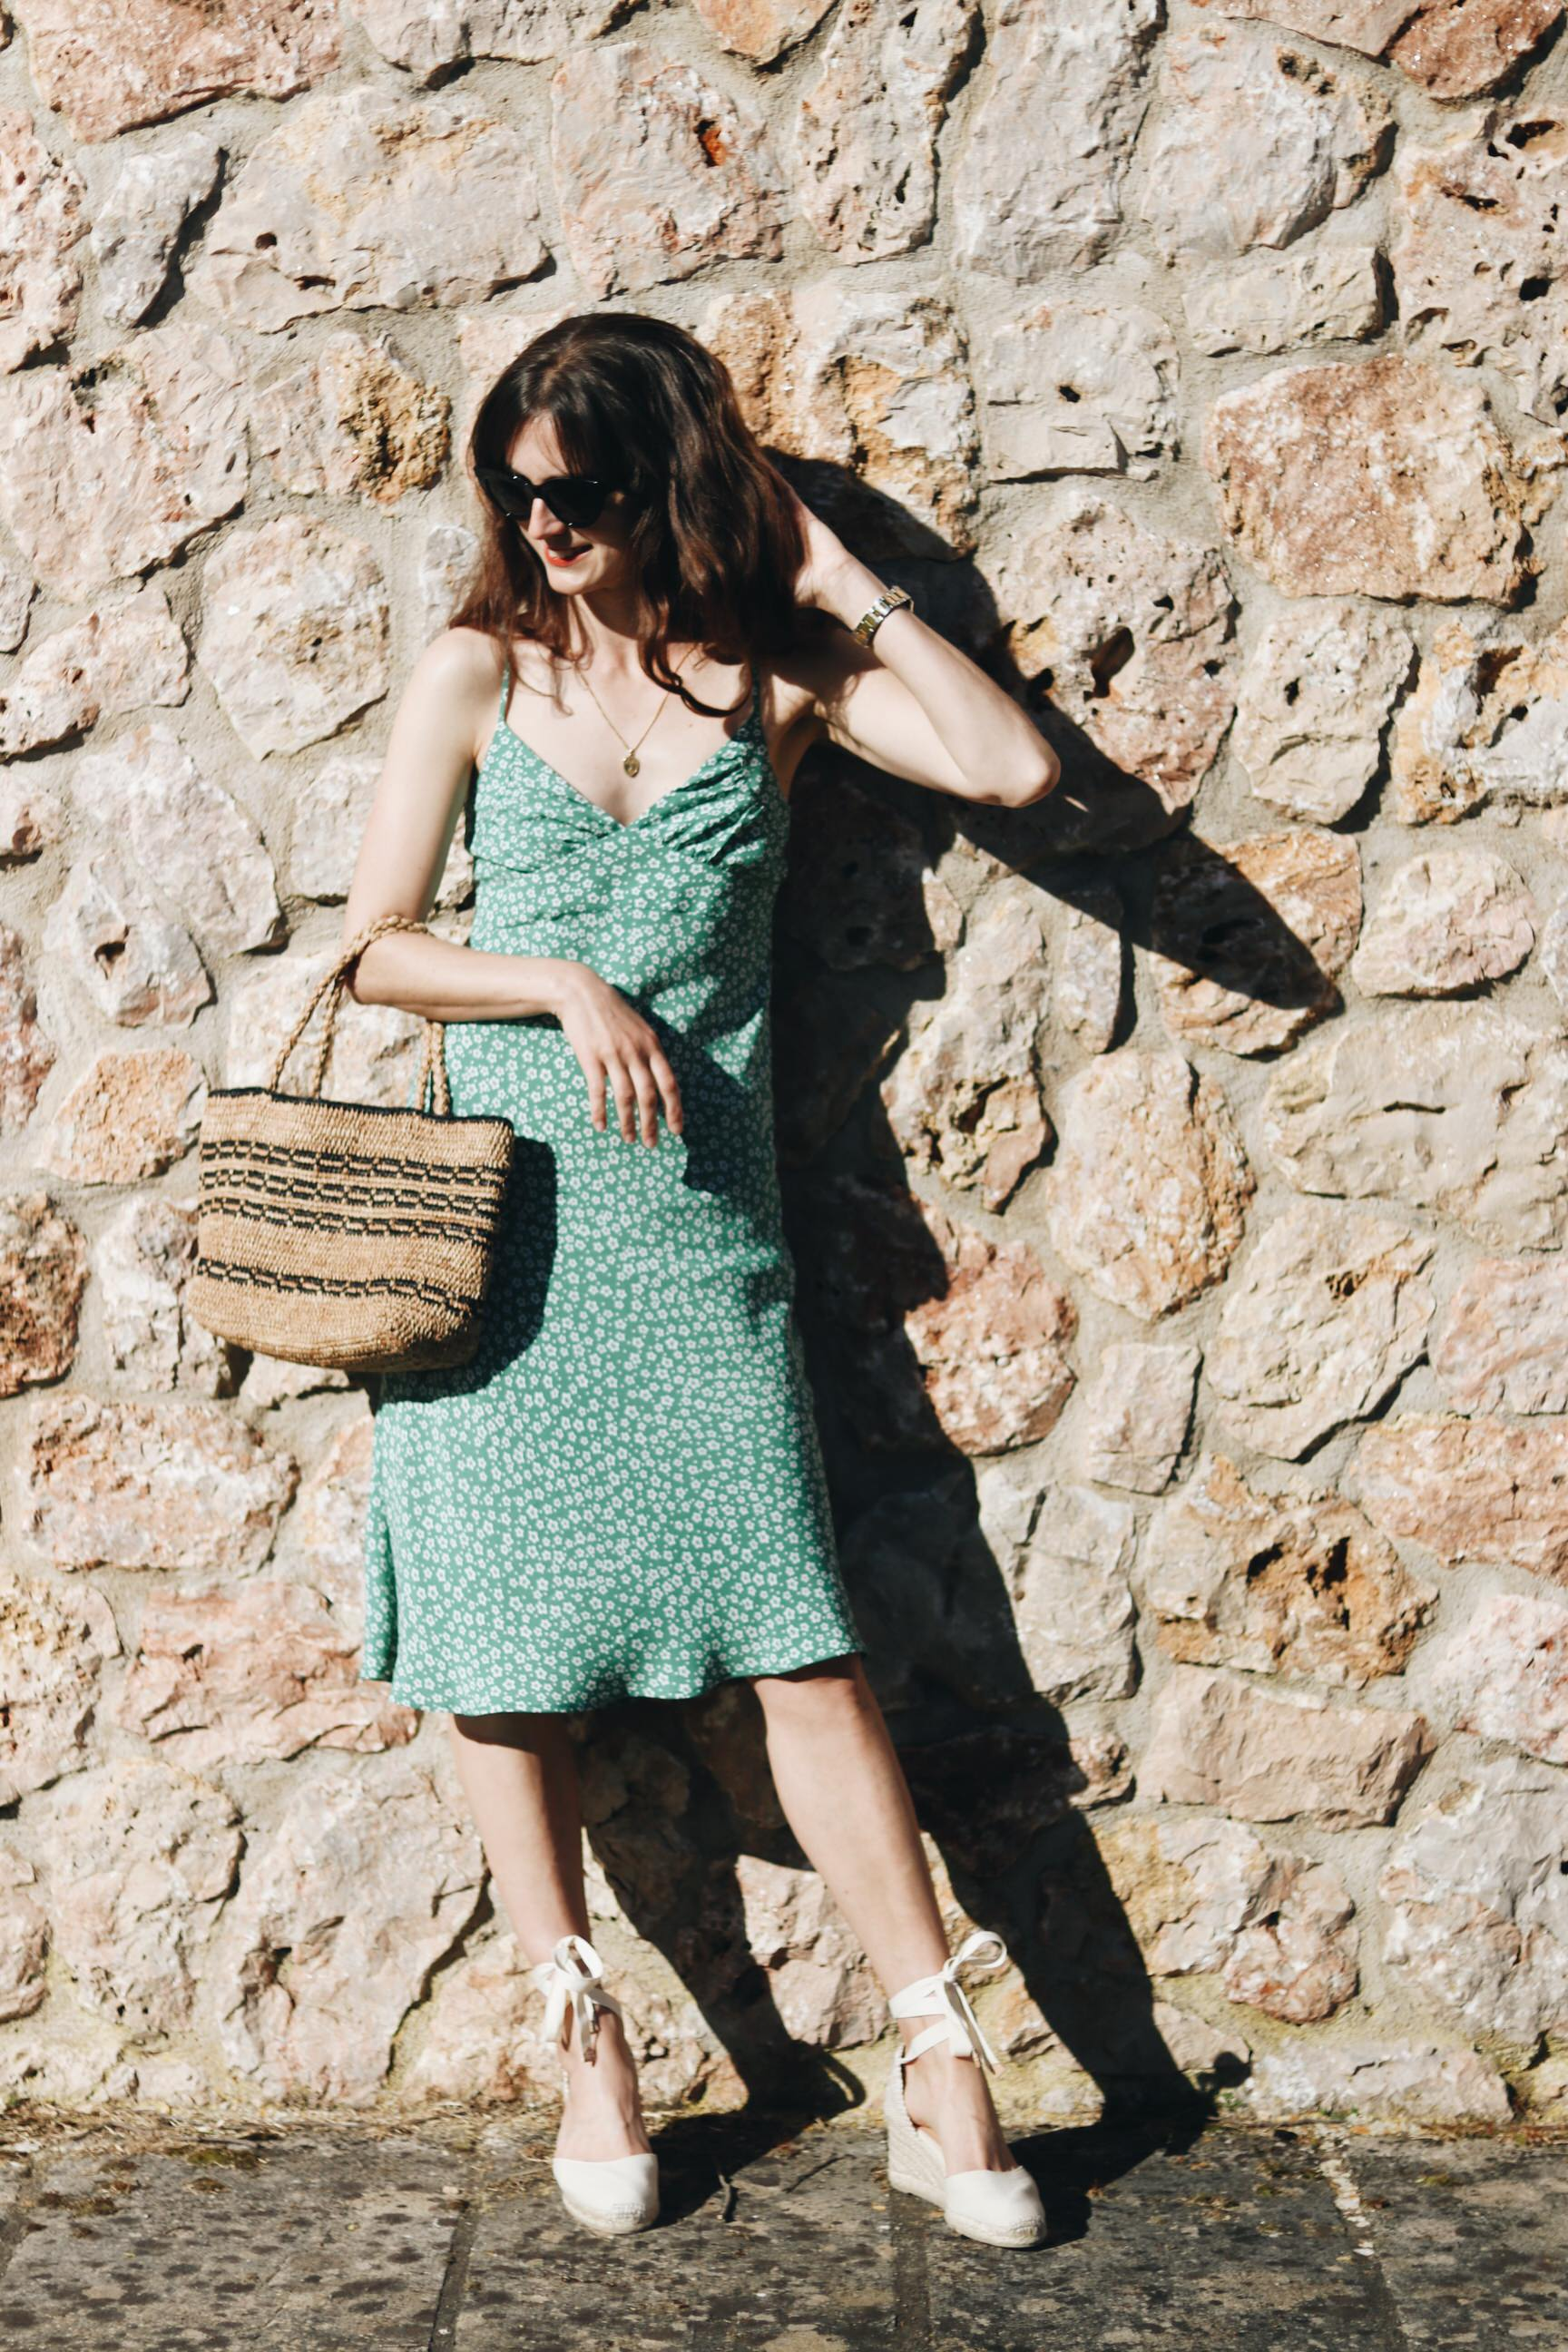 Sommeroutfit Blog Bloggerin Outfit Blumenmuster Korbtasche Espadrilles